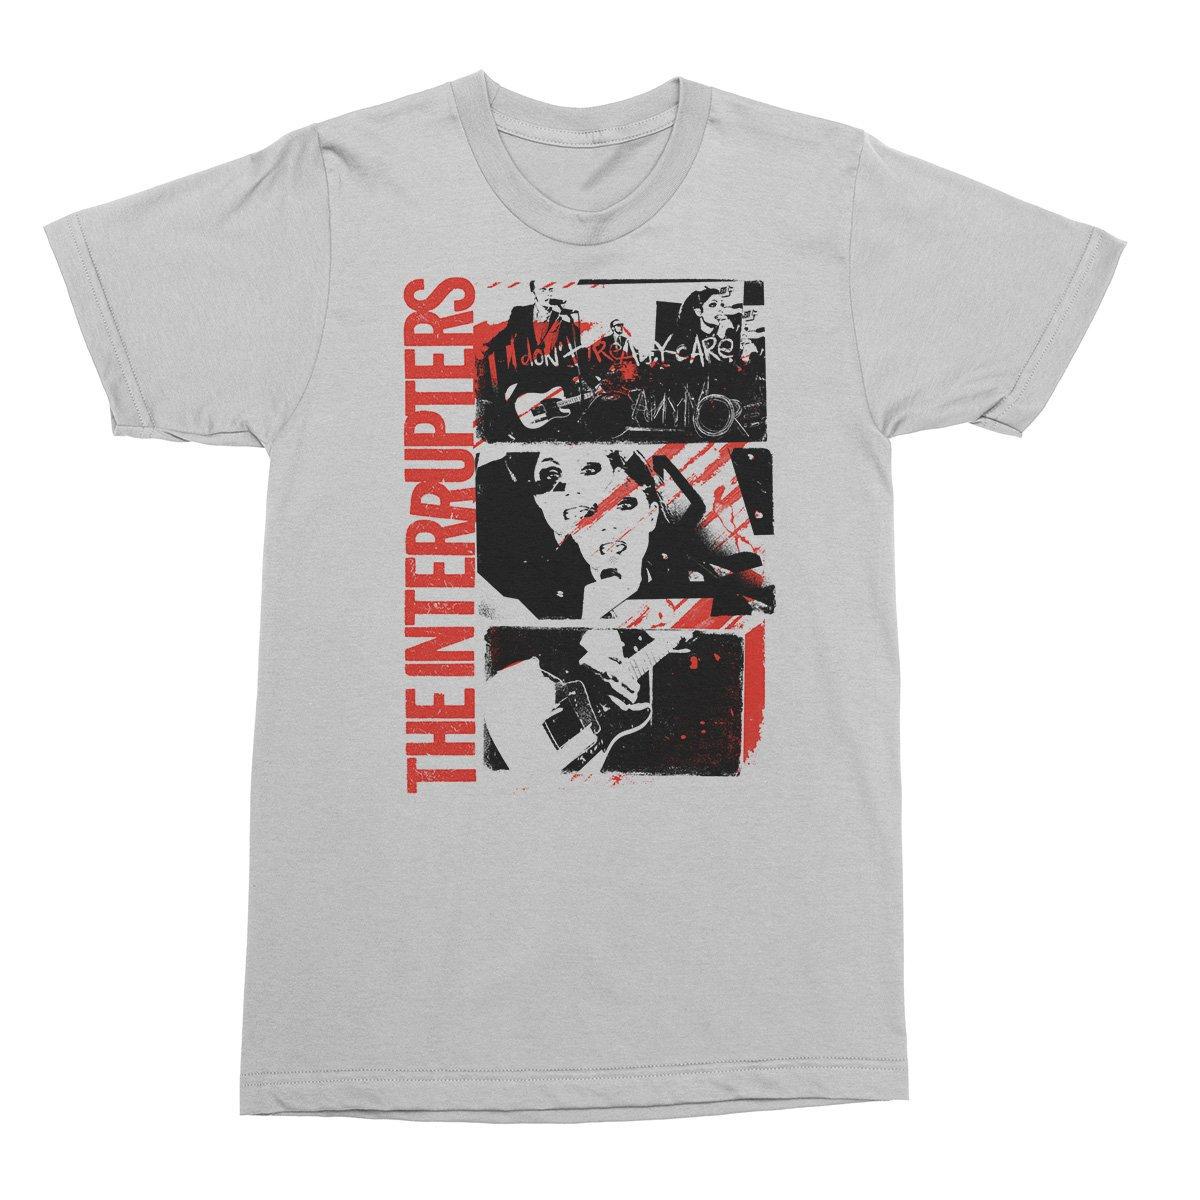 Don't Care T-Shirt (White)